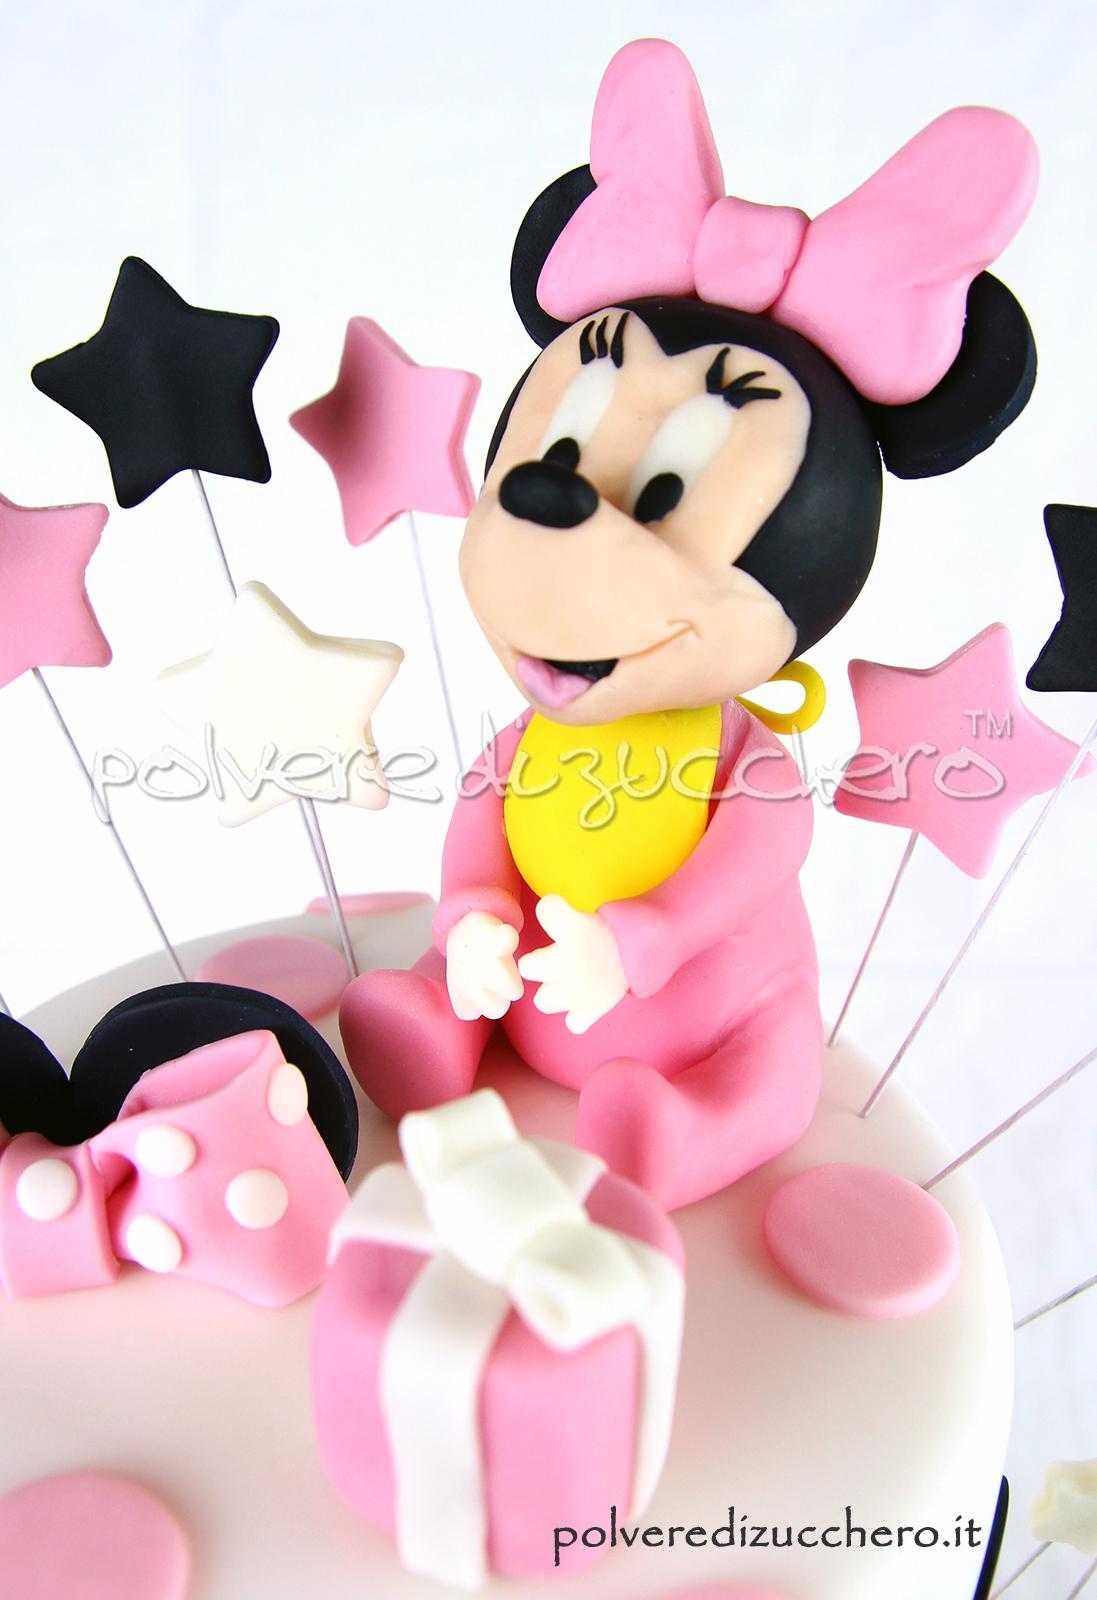 torta decorata pasta di zucchero cake design torta a piani bimba compleanno Minnie polvere di zucchero mInnie cake